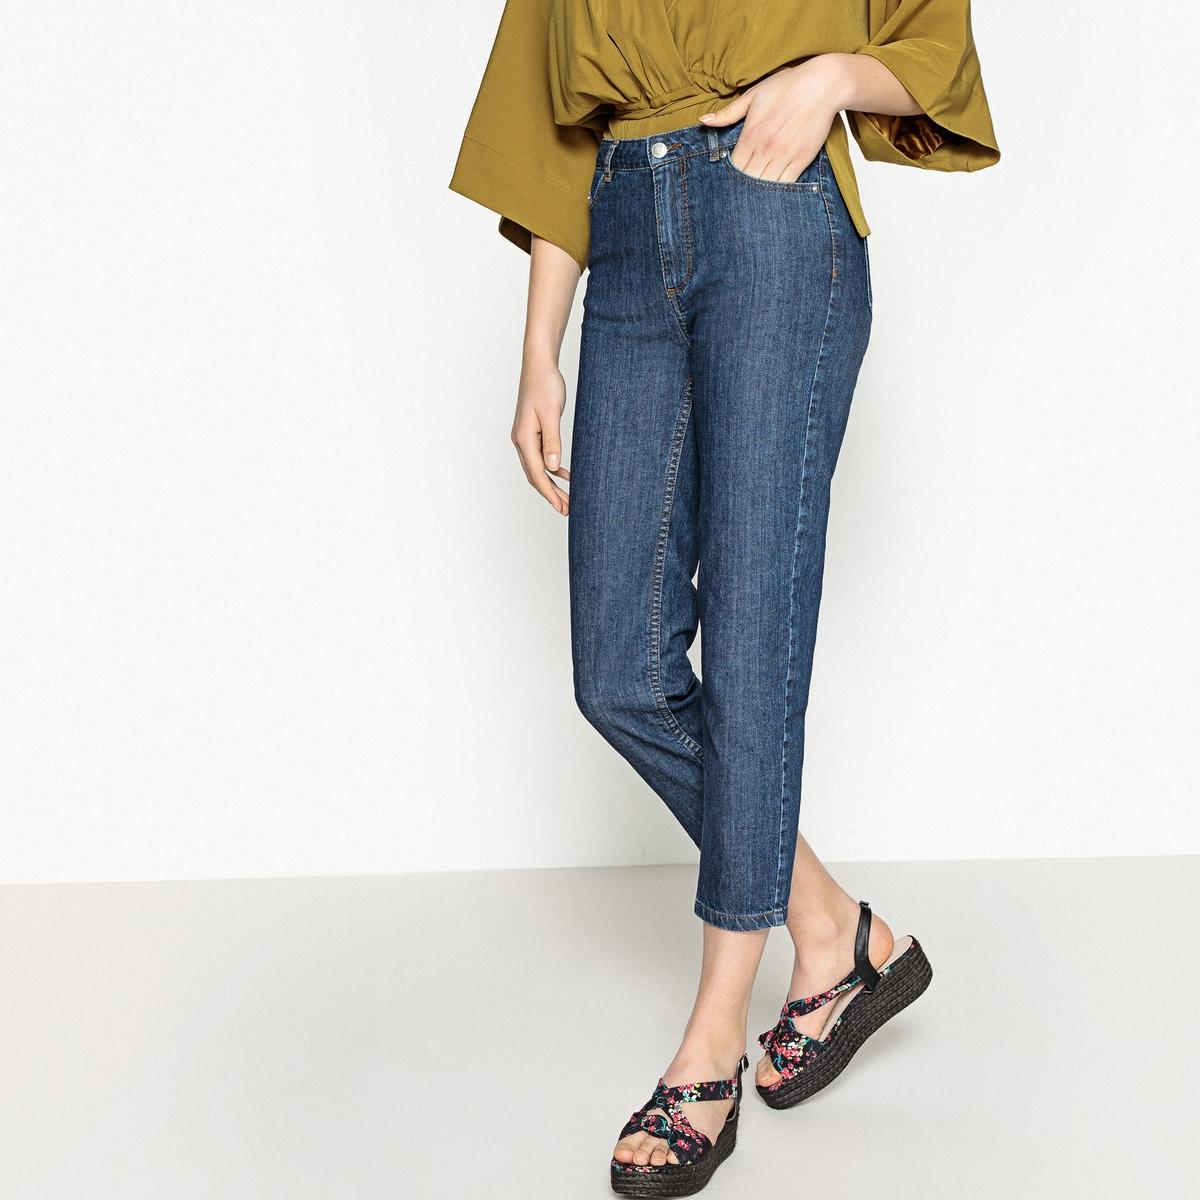 Jeans direitos cropped